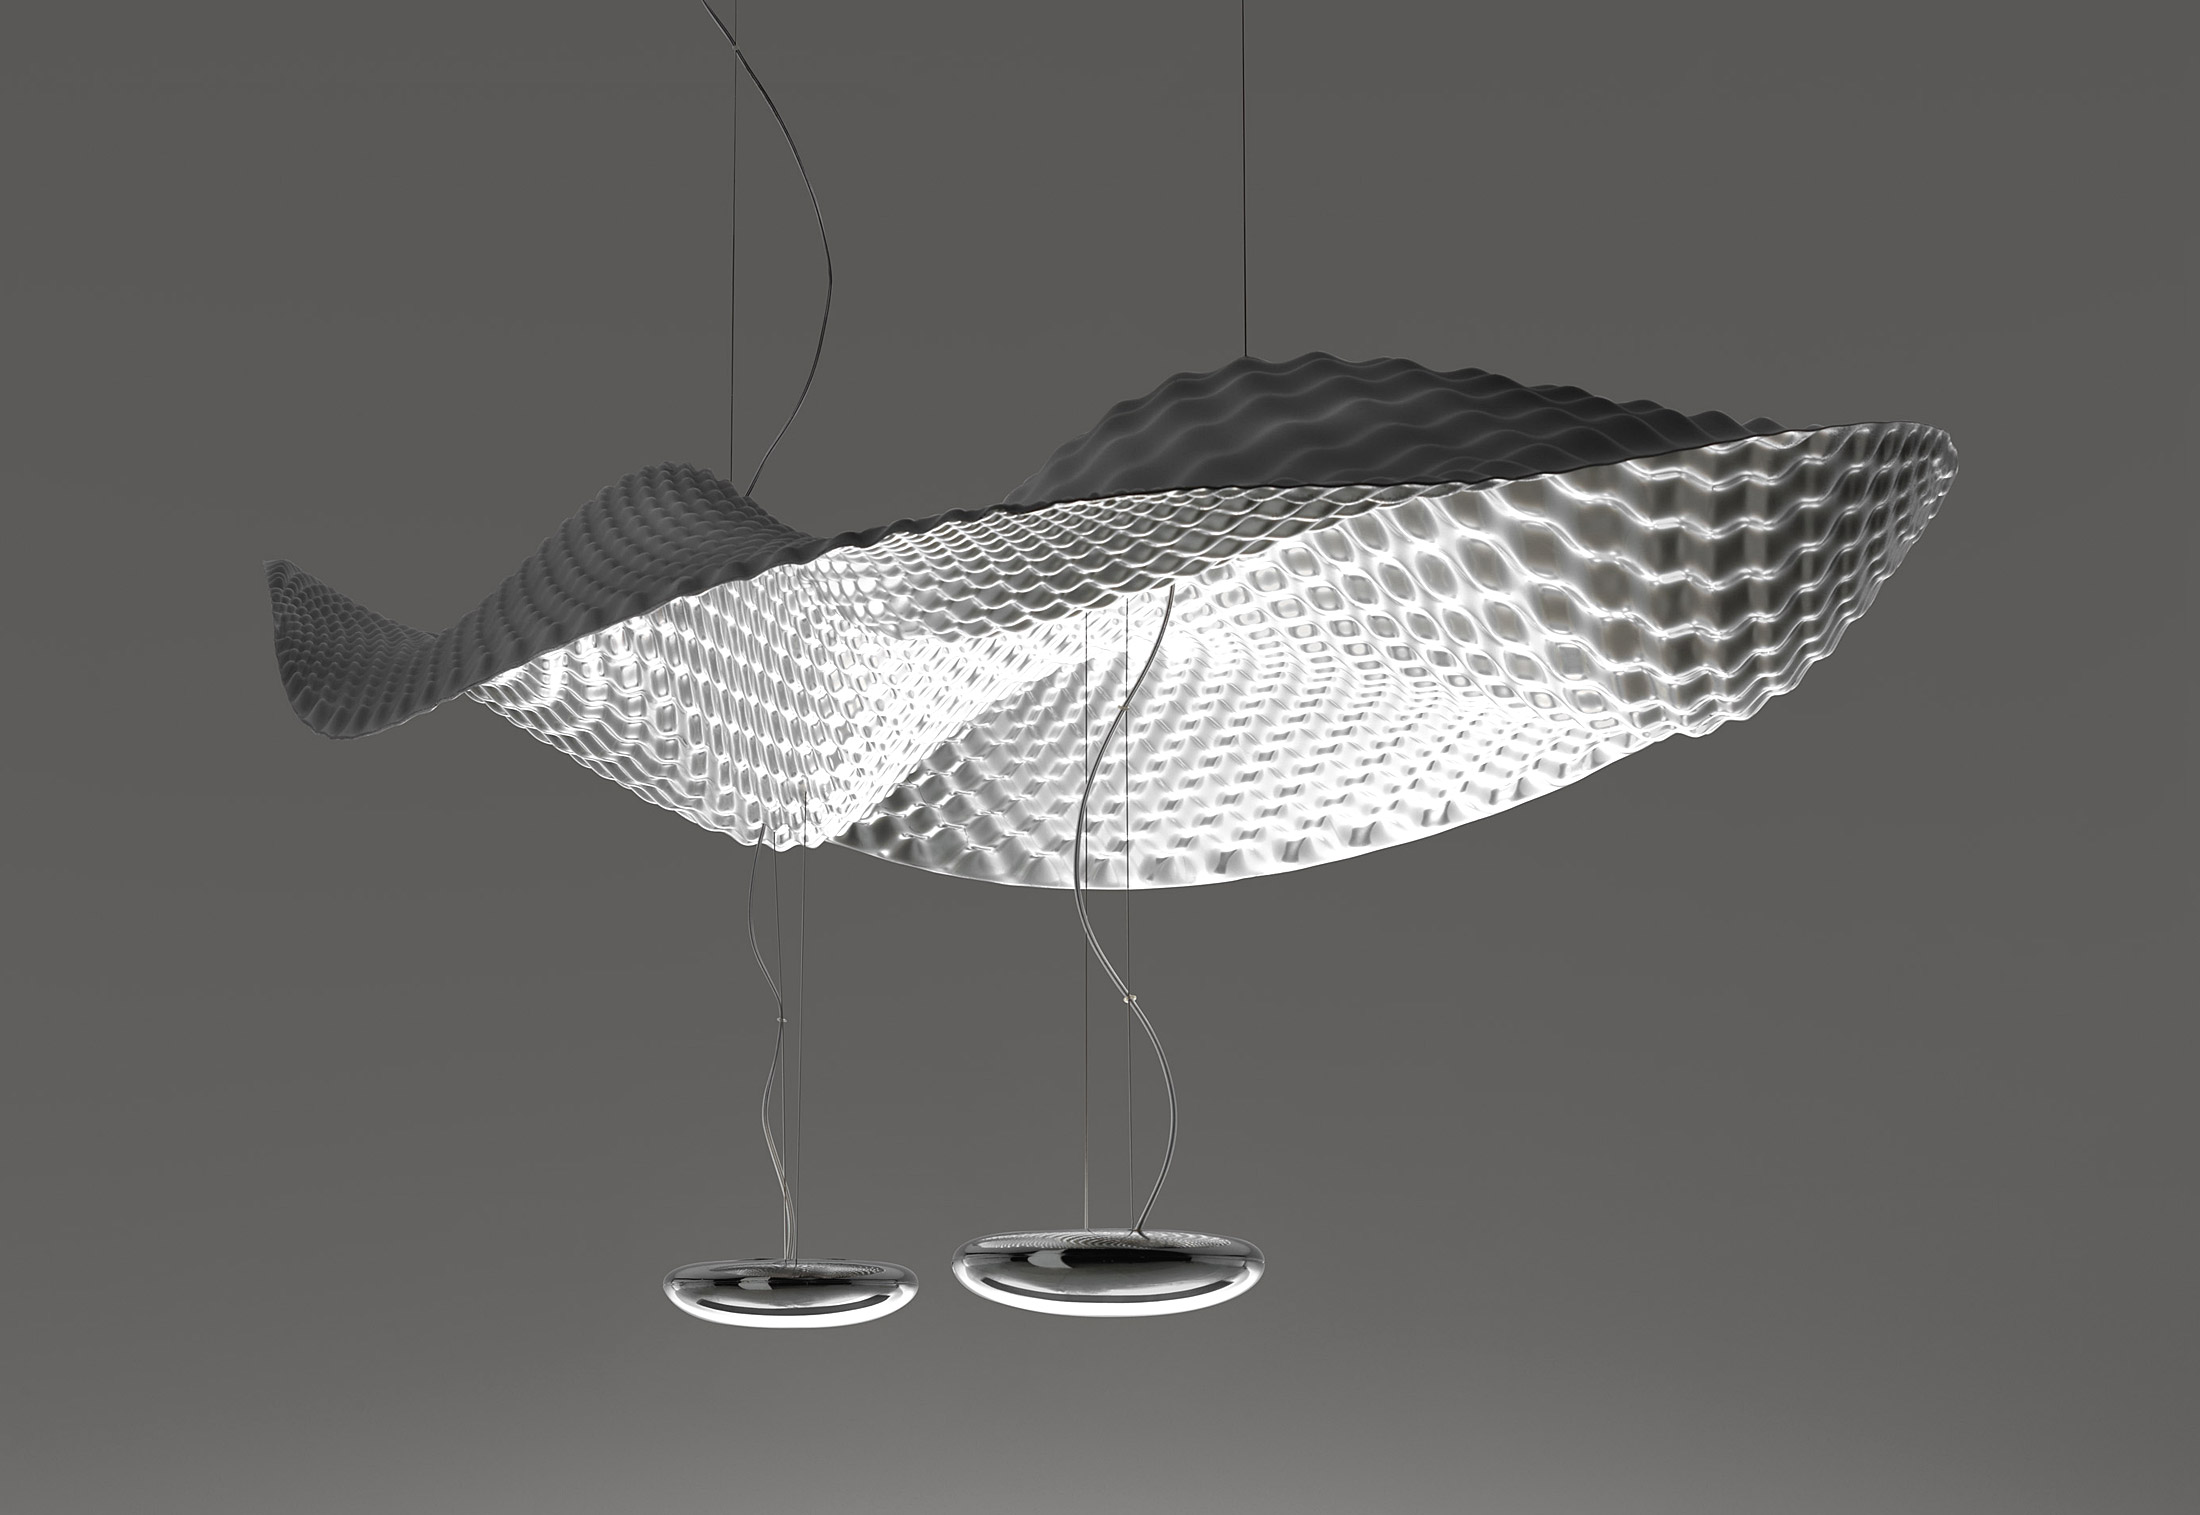 Cosmic Angel sospensione di Artemide   Lampadari   Illuminazione   Mollura Home Design -> Lampadari Artemide Sospensione